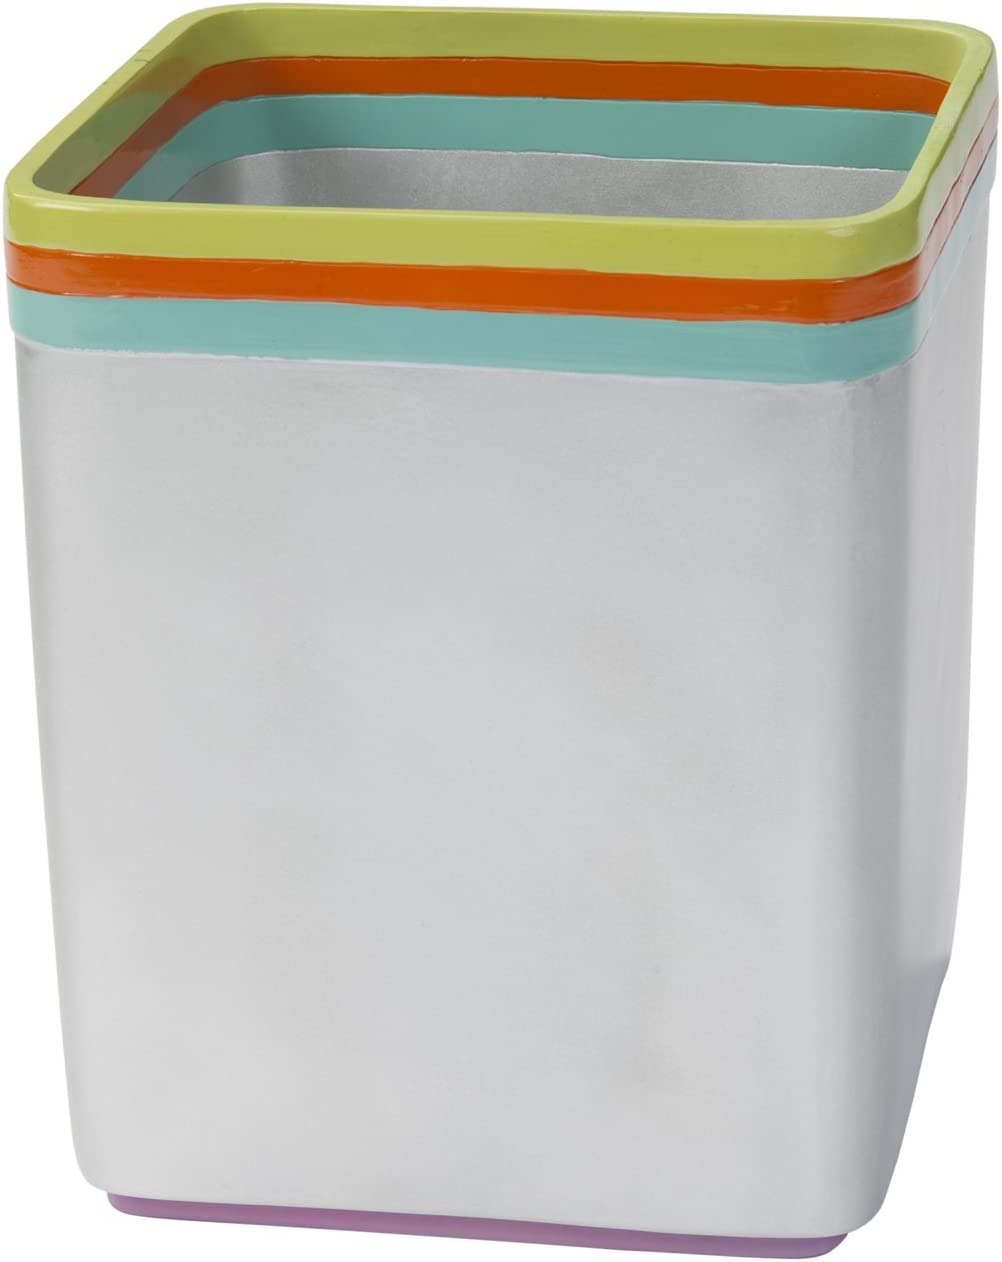 Creative Bath Products JAZ54MULT Jazz Waste Basket, Orange